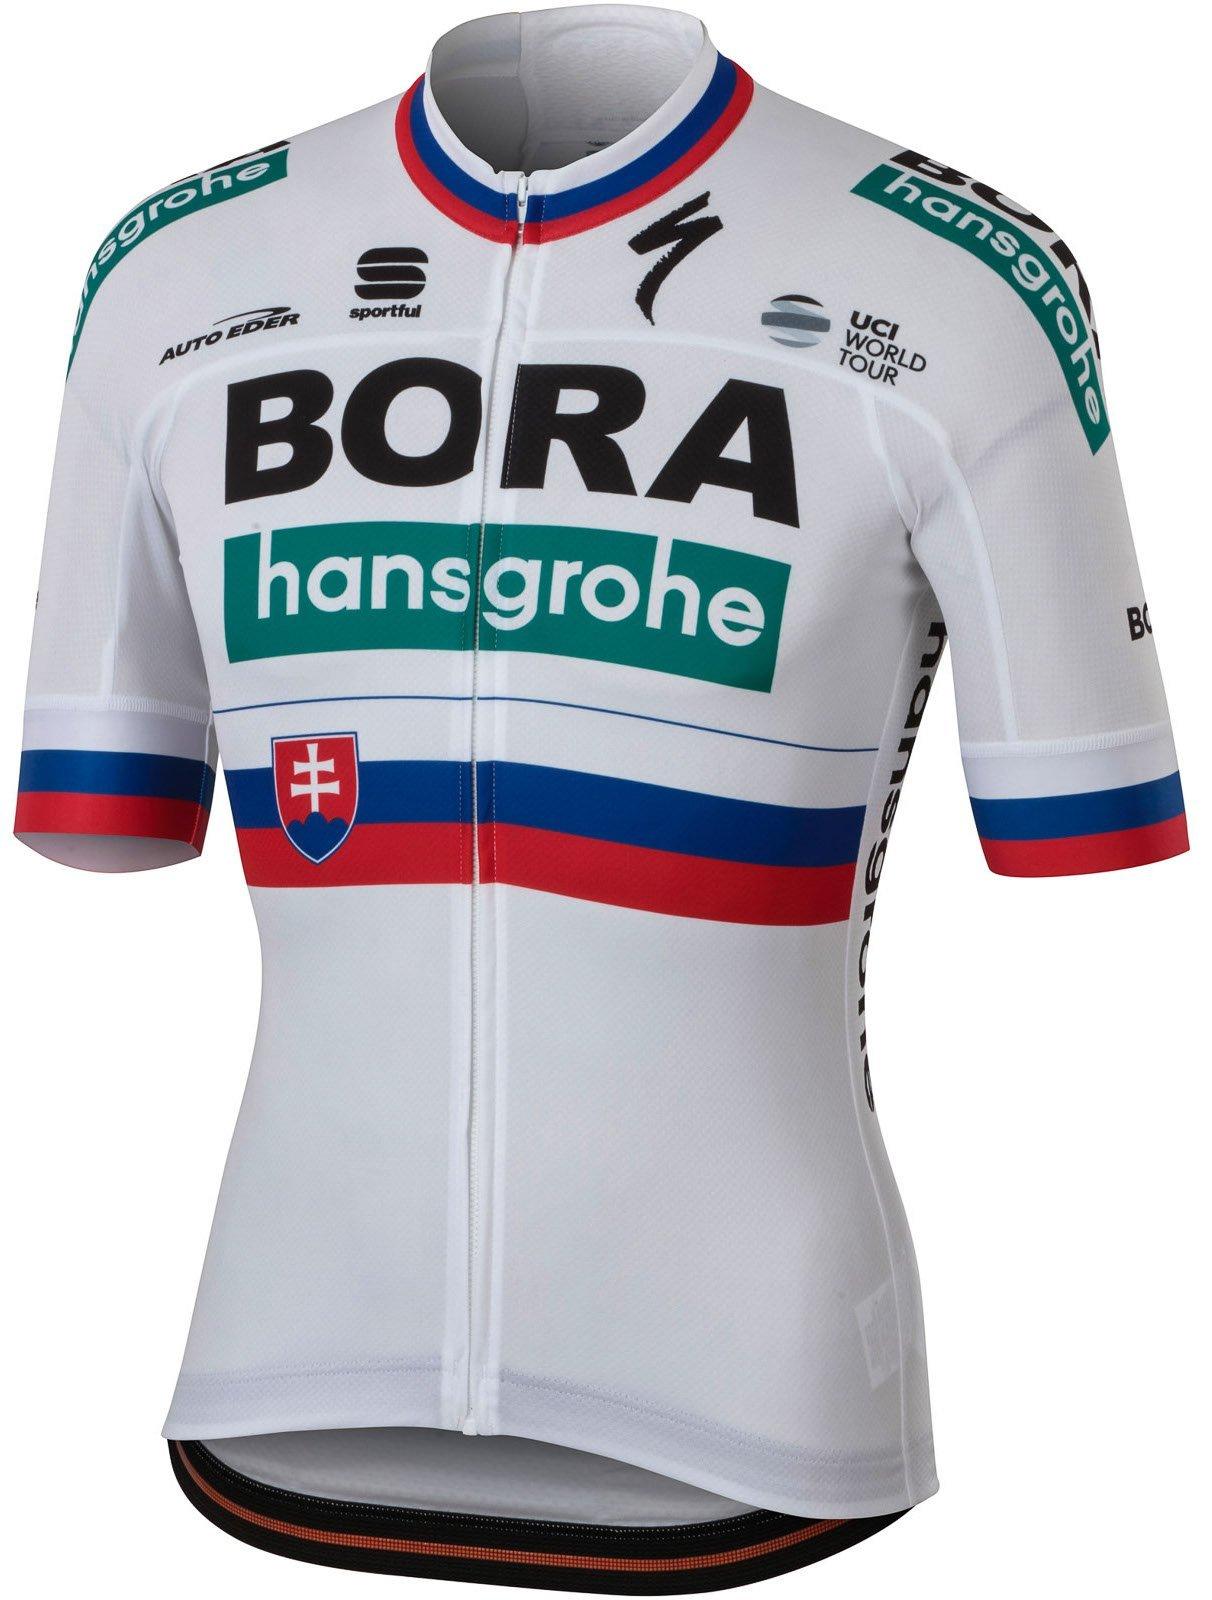 d1d248df5 SPORTFUL BORA - HANSGROHE MISTR SLOVENSKA DRES - Sportby